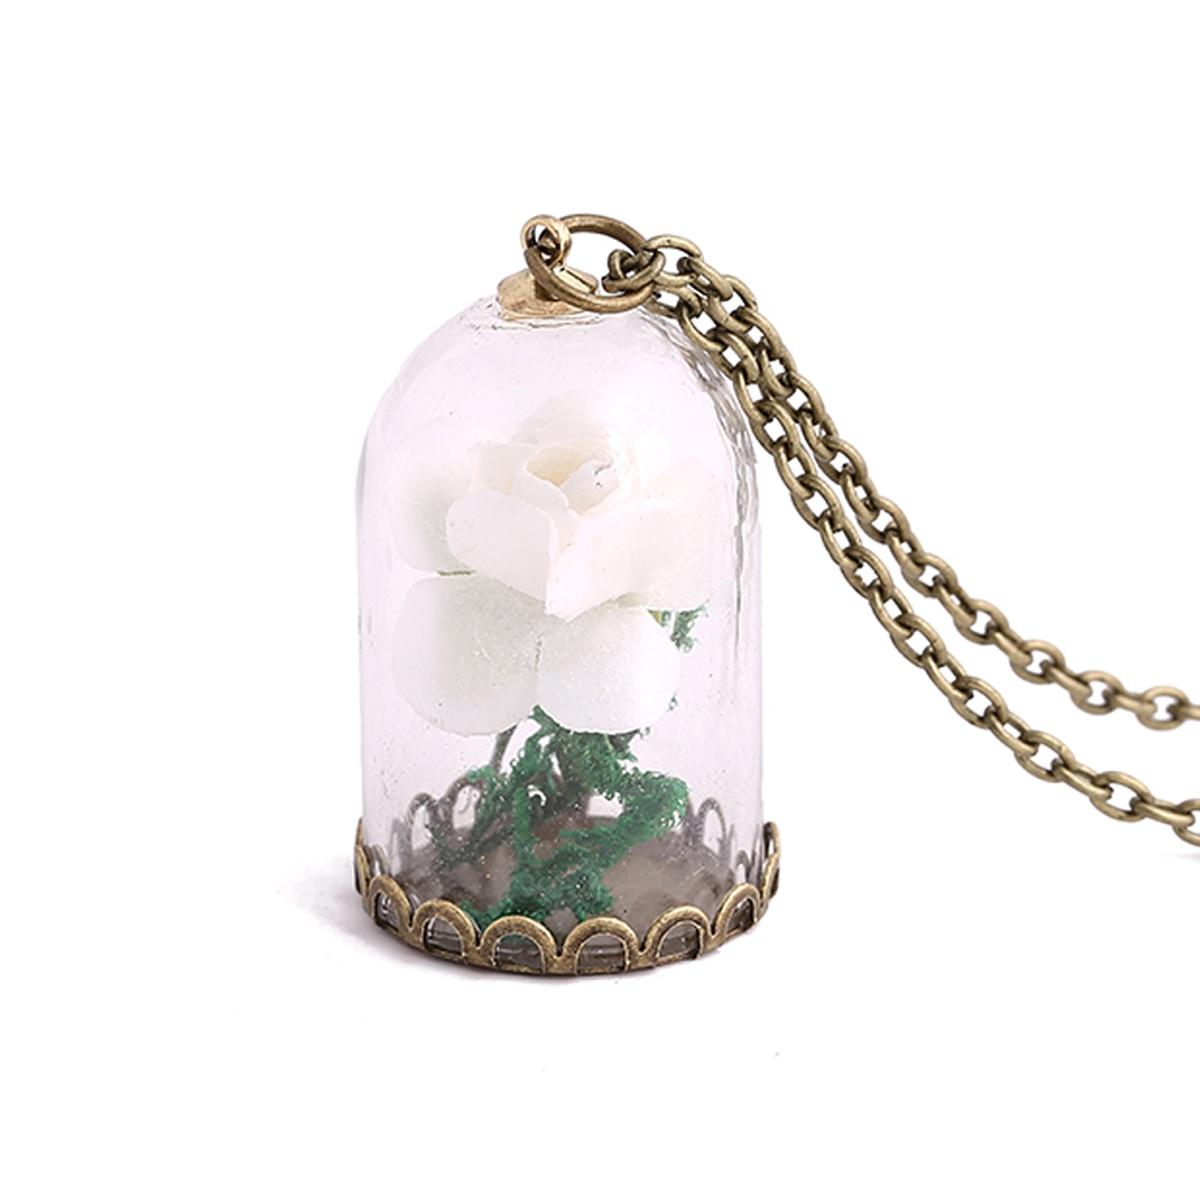 Vintage Glow In The Dark Jewelry Luminous Flower Pendant Necklace Glass  Wishing Bottle Chain Long Statement